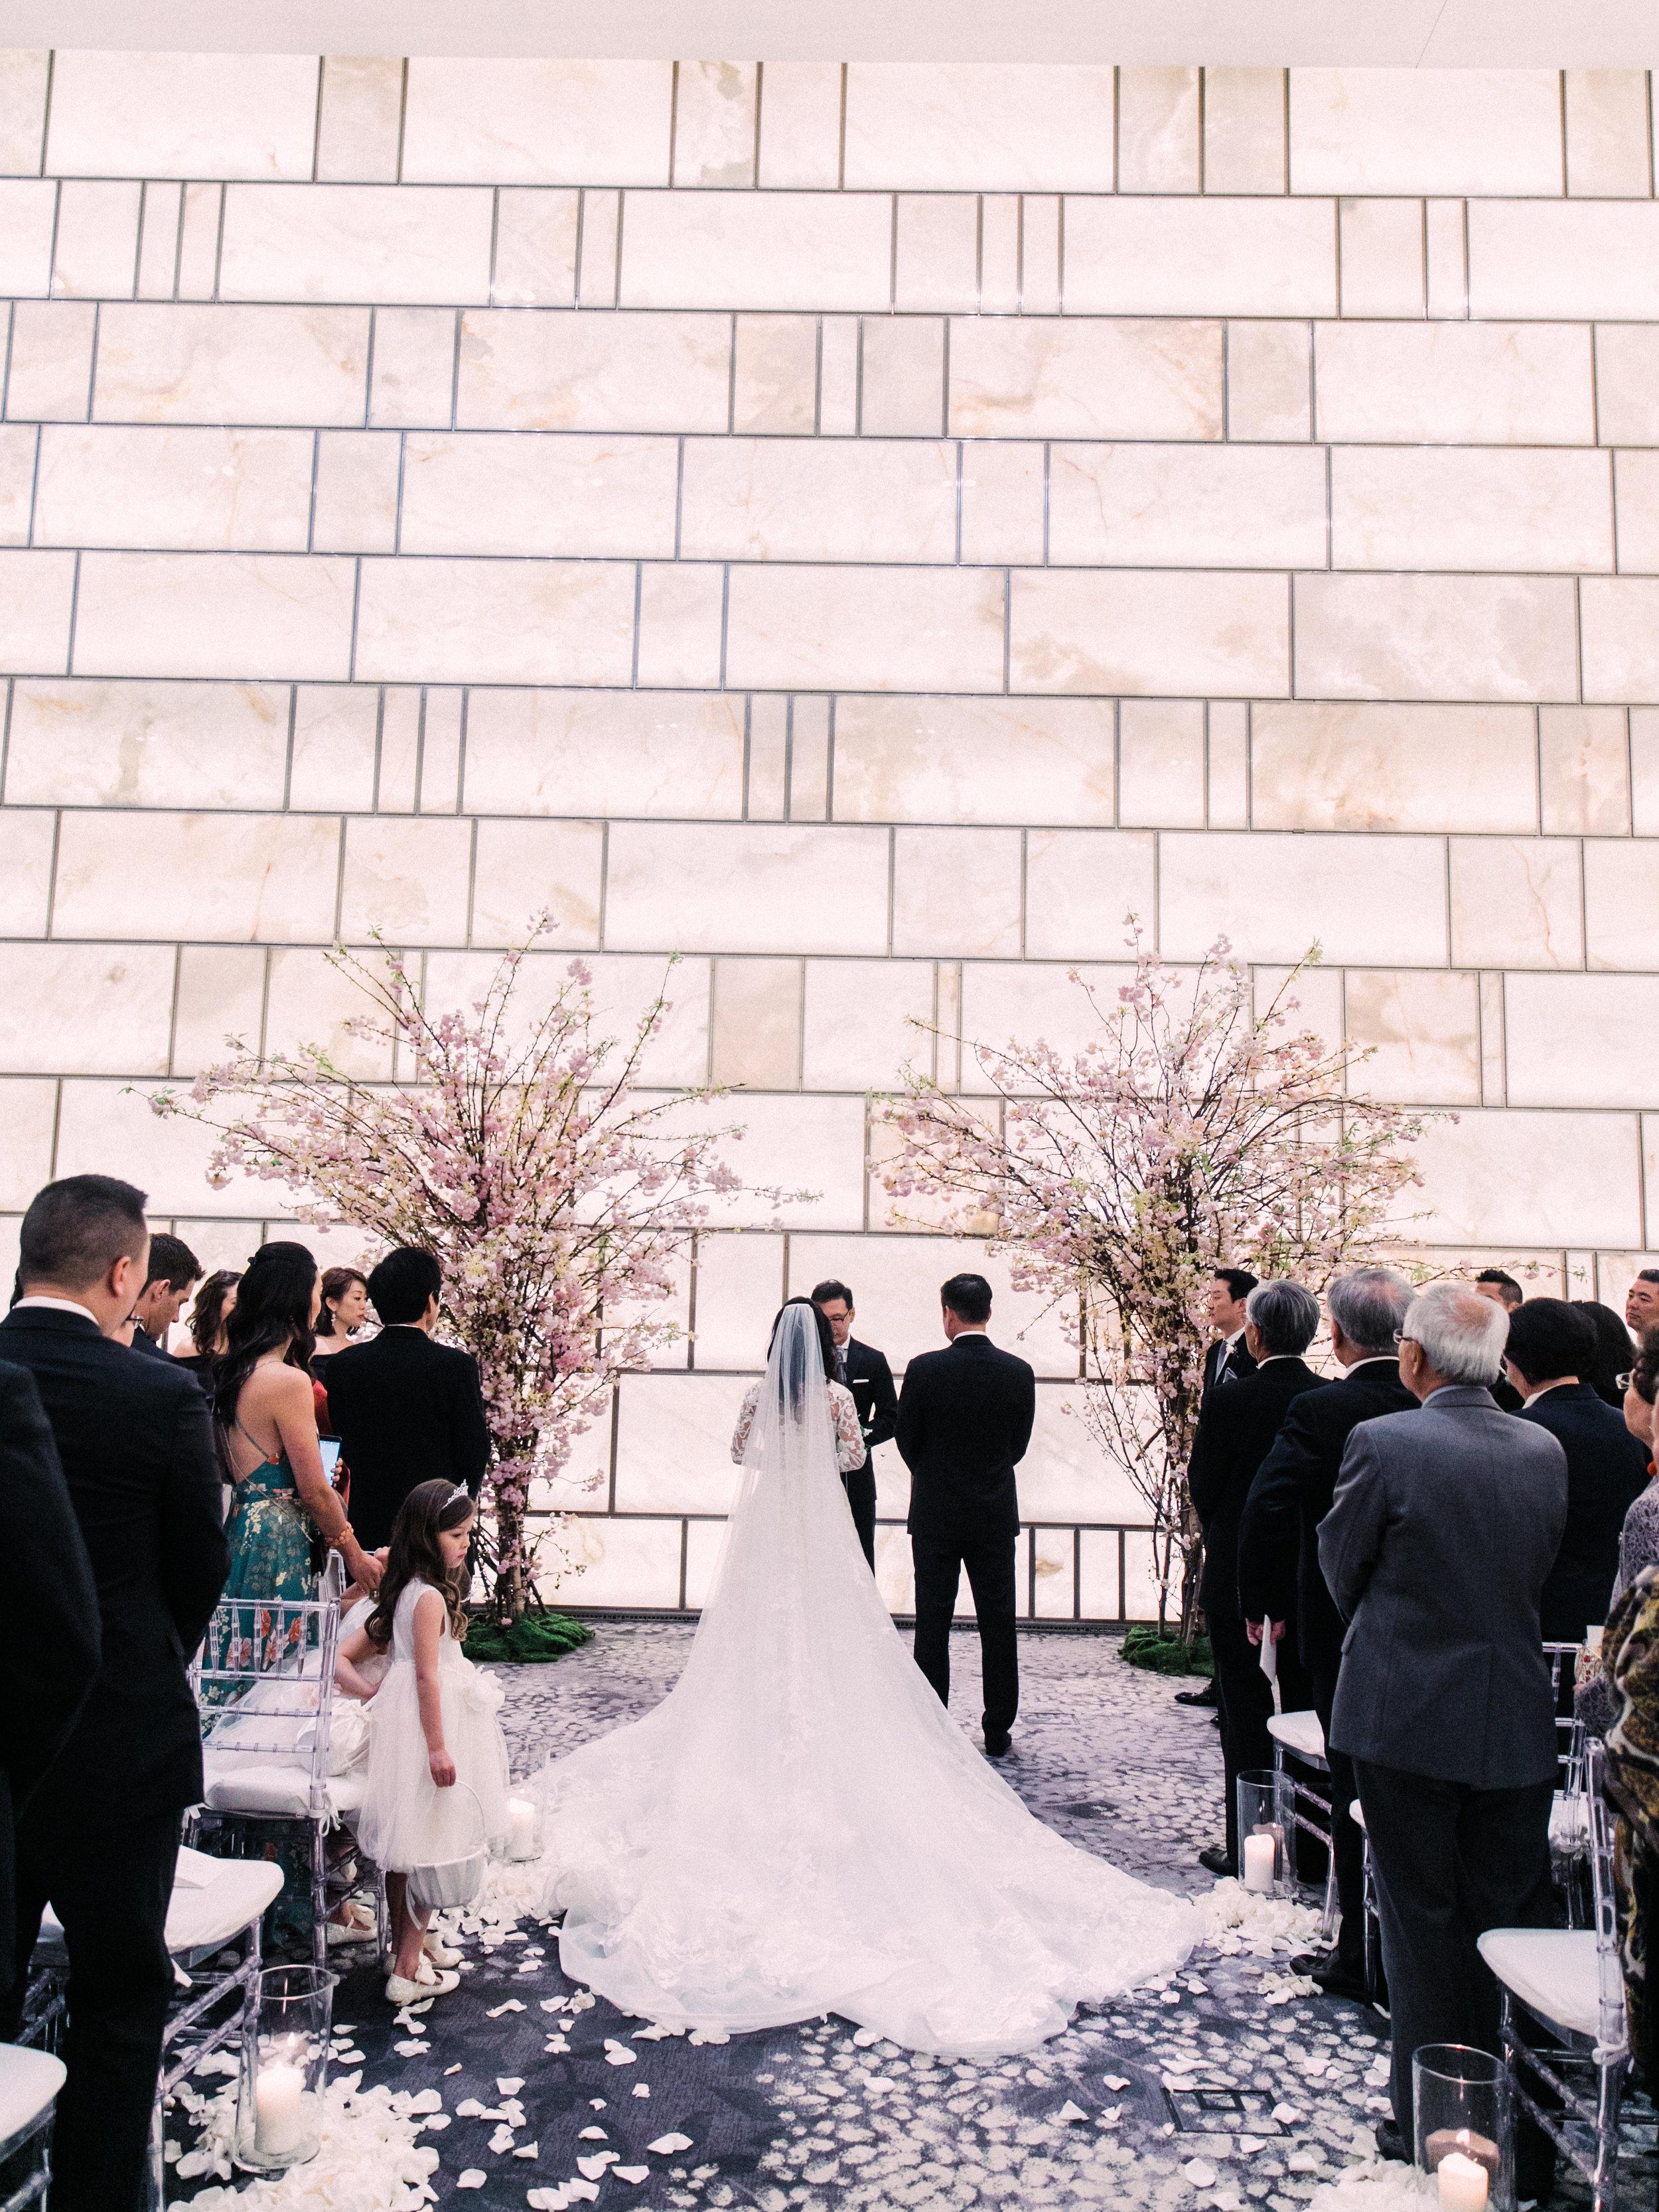 A Park Hyatt New York Wedding - The Overwhelmed Bride Wedding Inspiration Ideas Blog